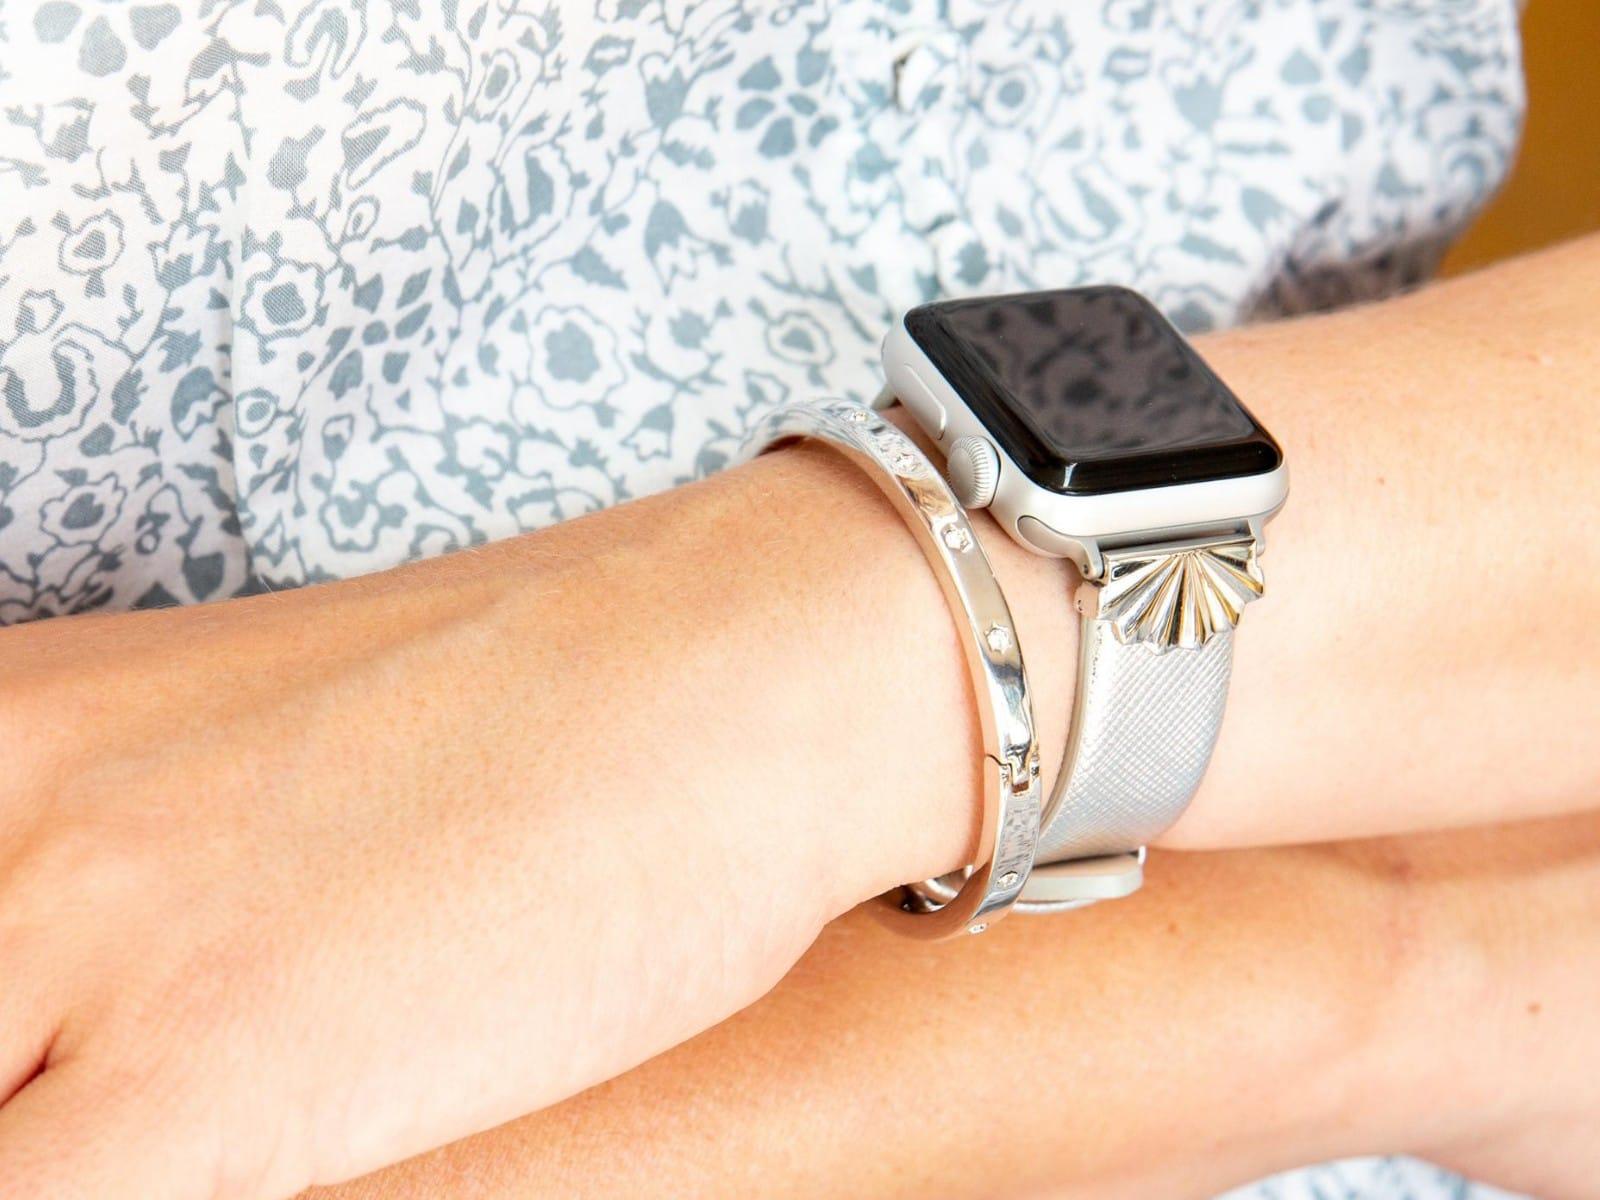 Goldenerre Starburst band for Apple Watch